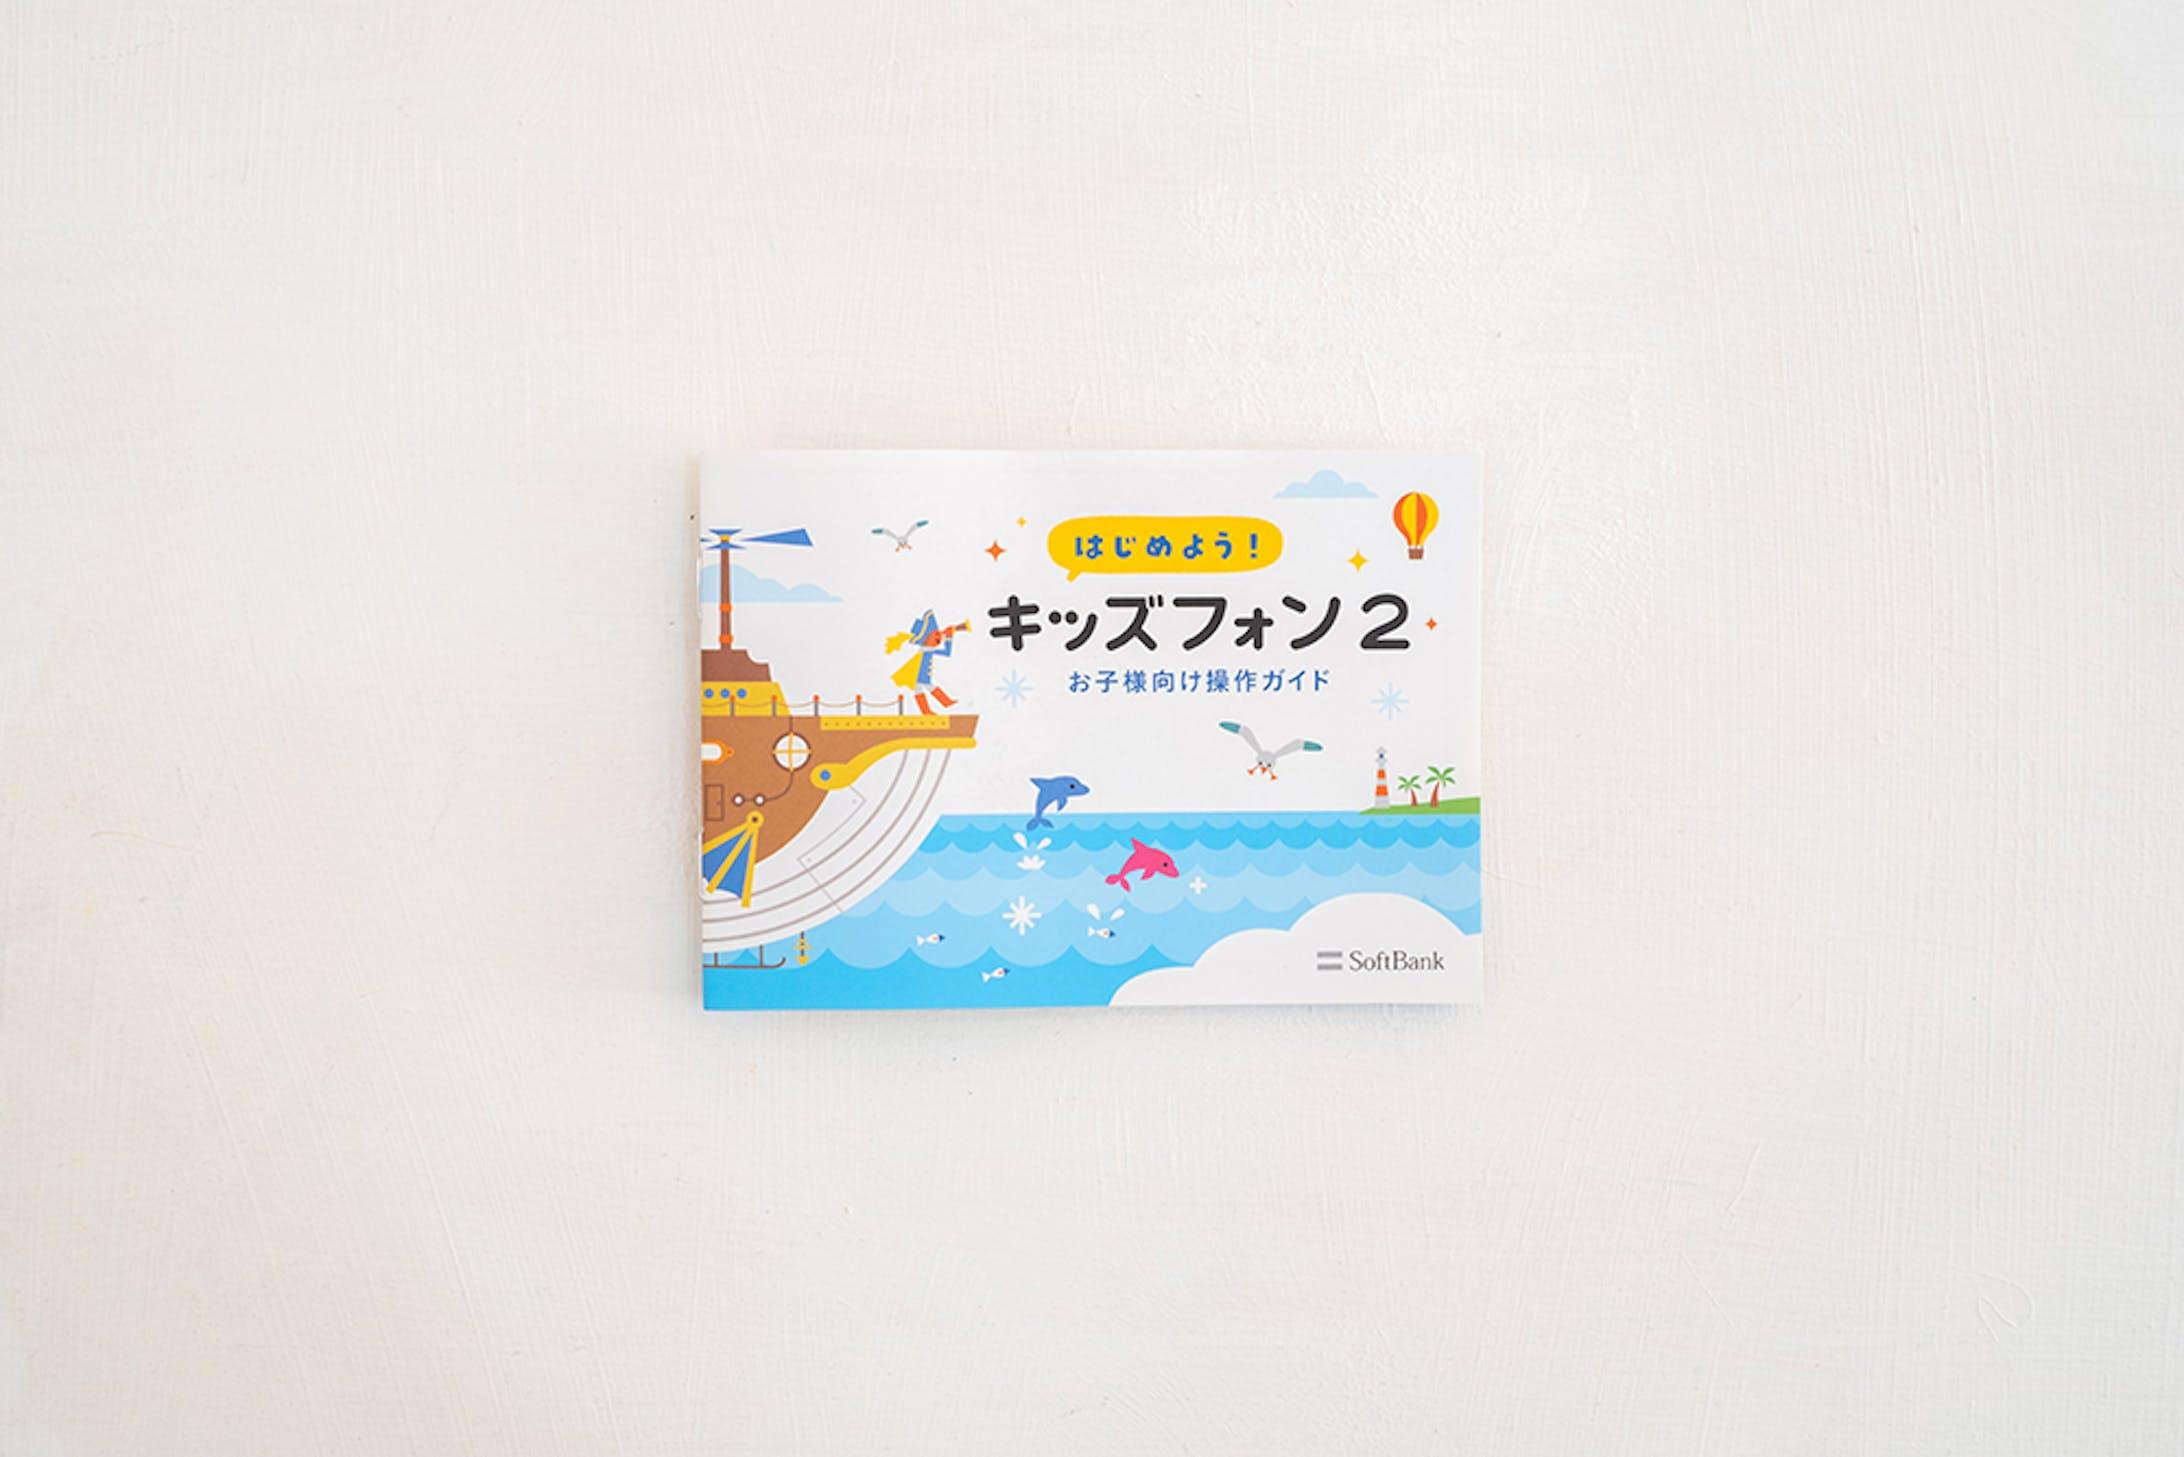 SoftBank キッズフォン2-5